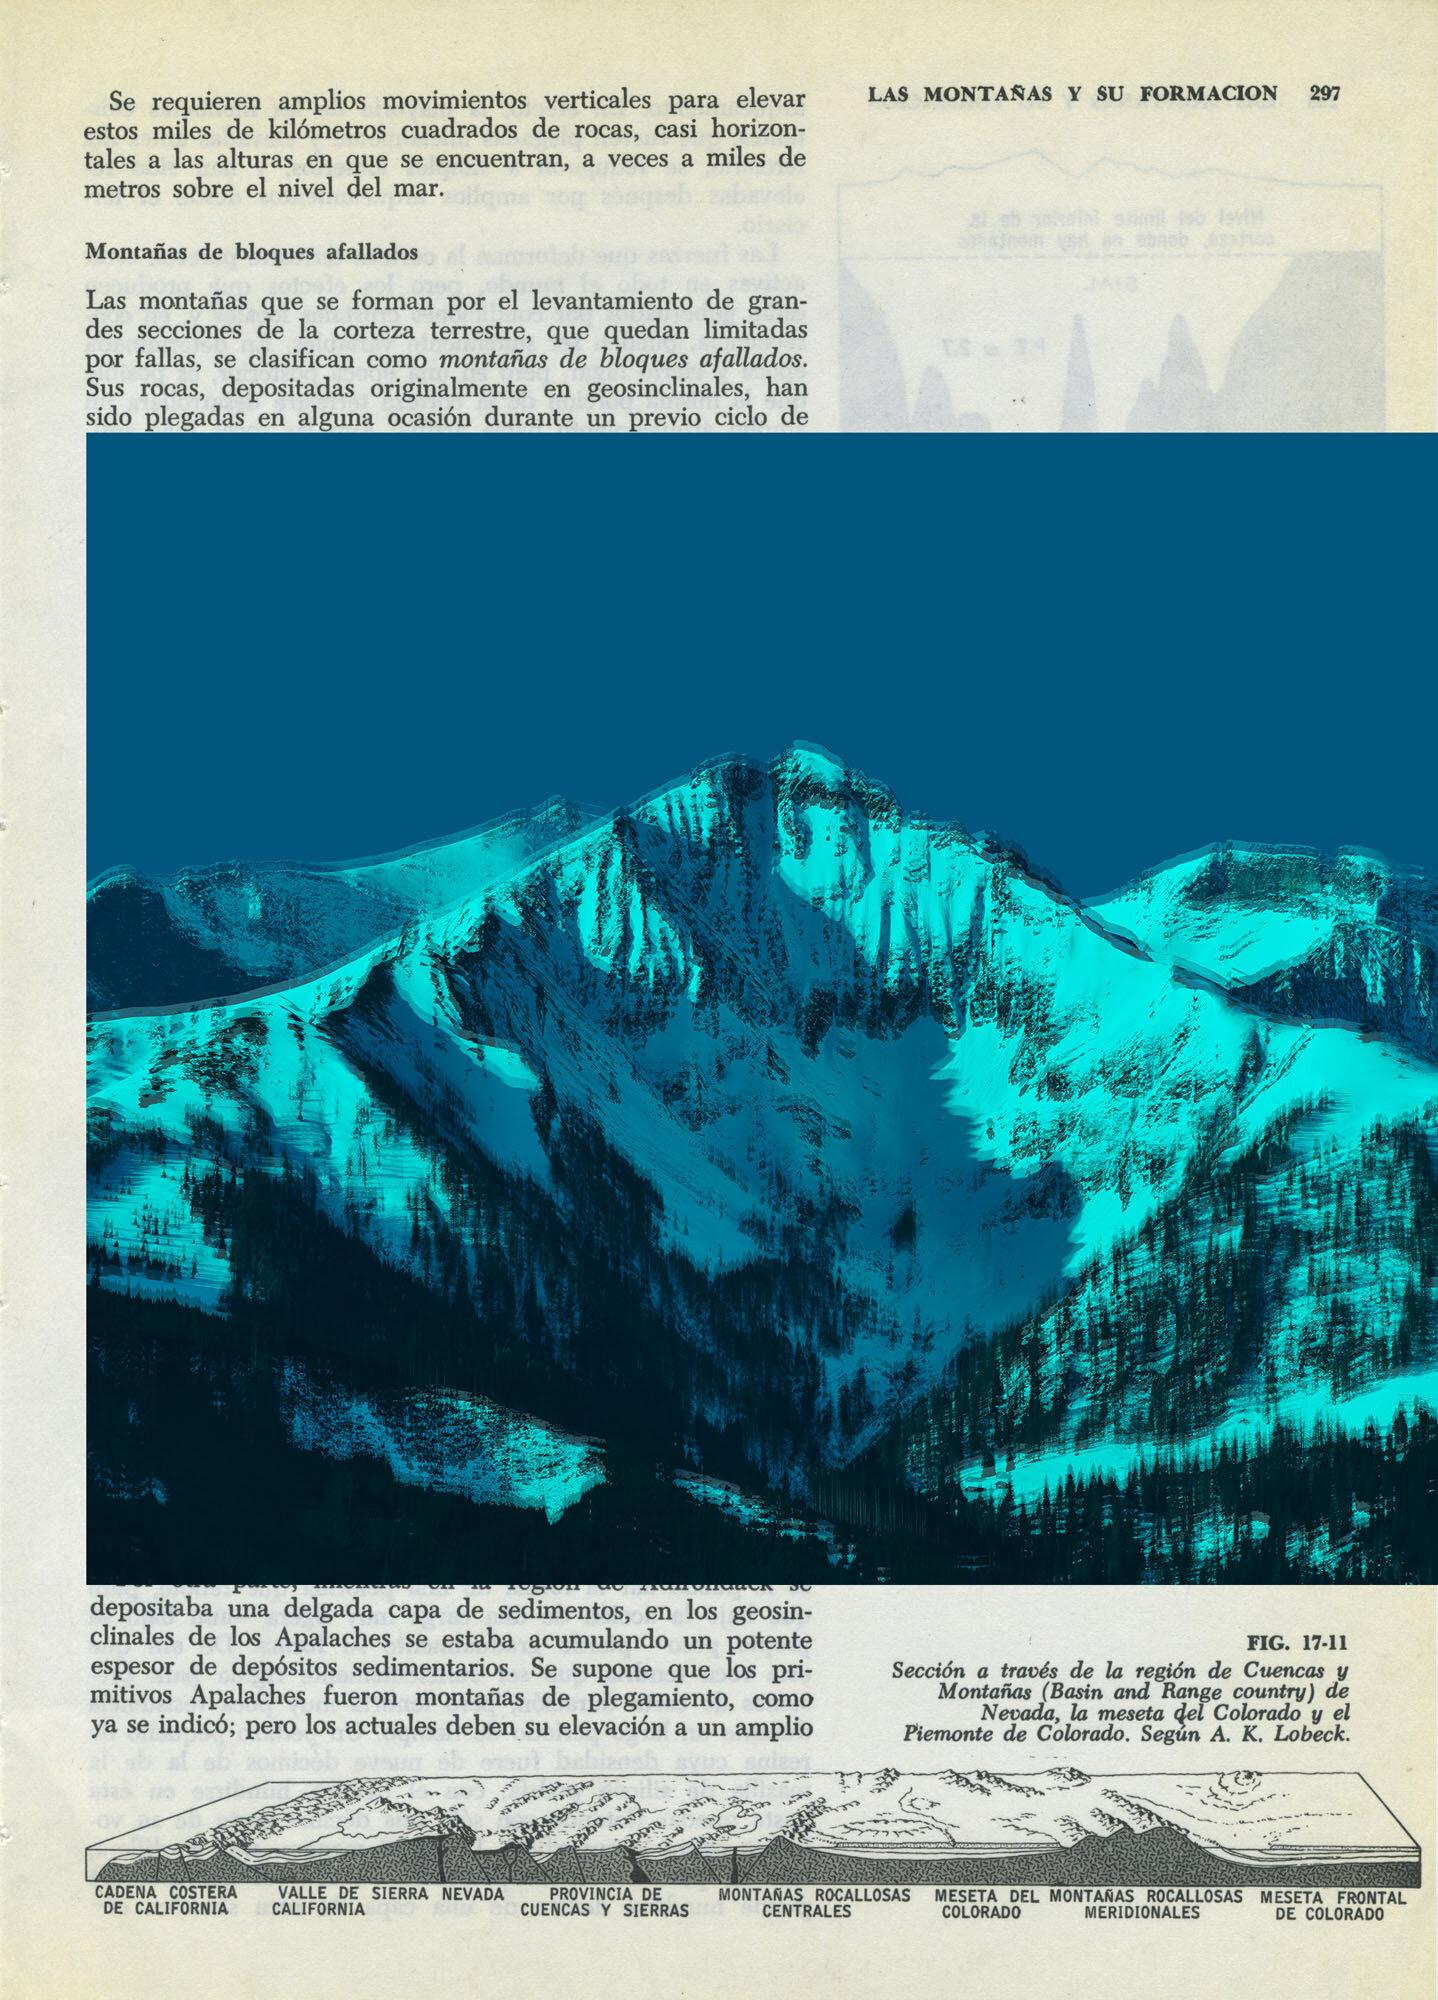 190205 NoA MountainFormation 5.jpg